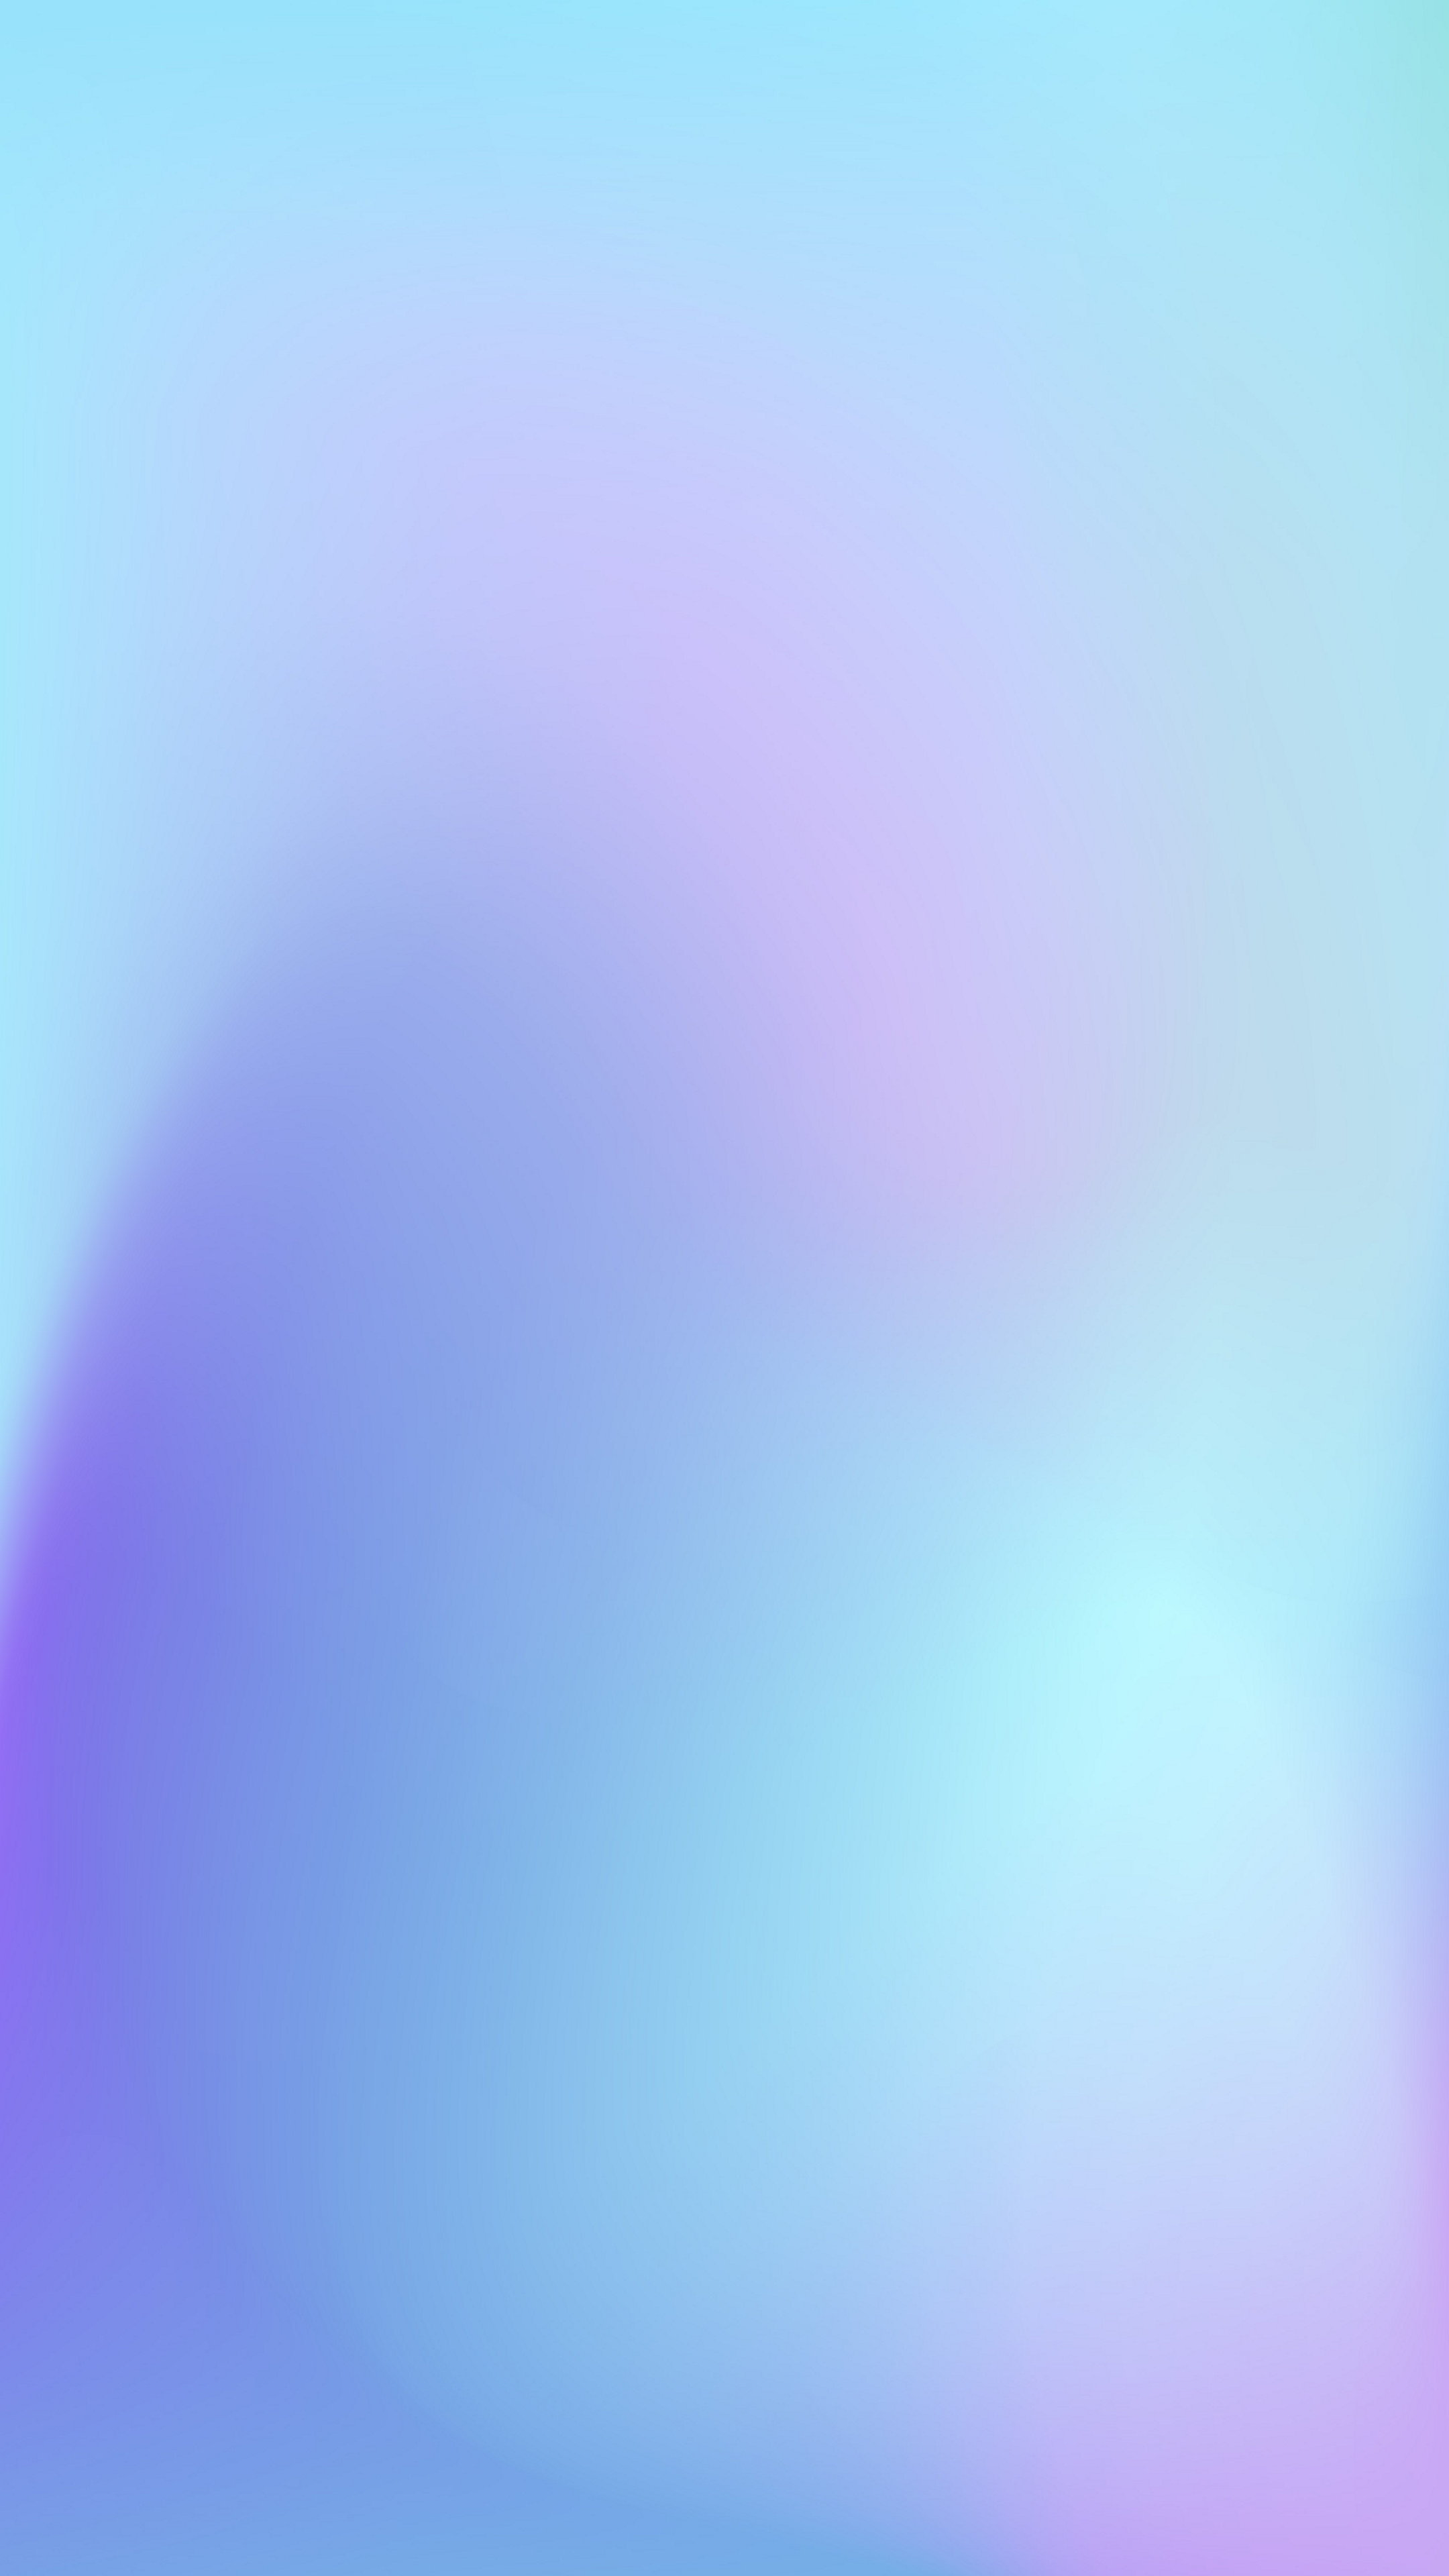 Pale Cornflower Blue Gradient Wallpaper